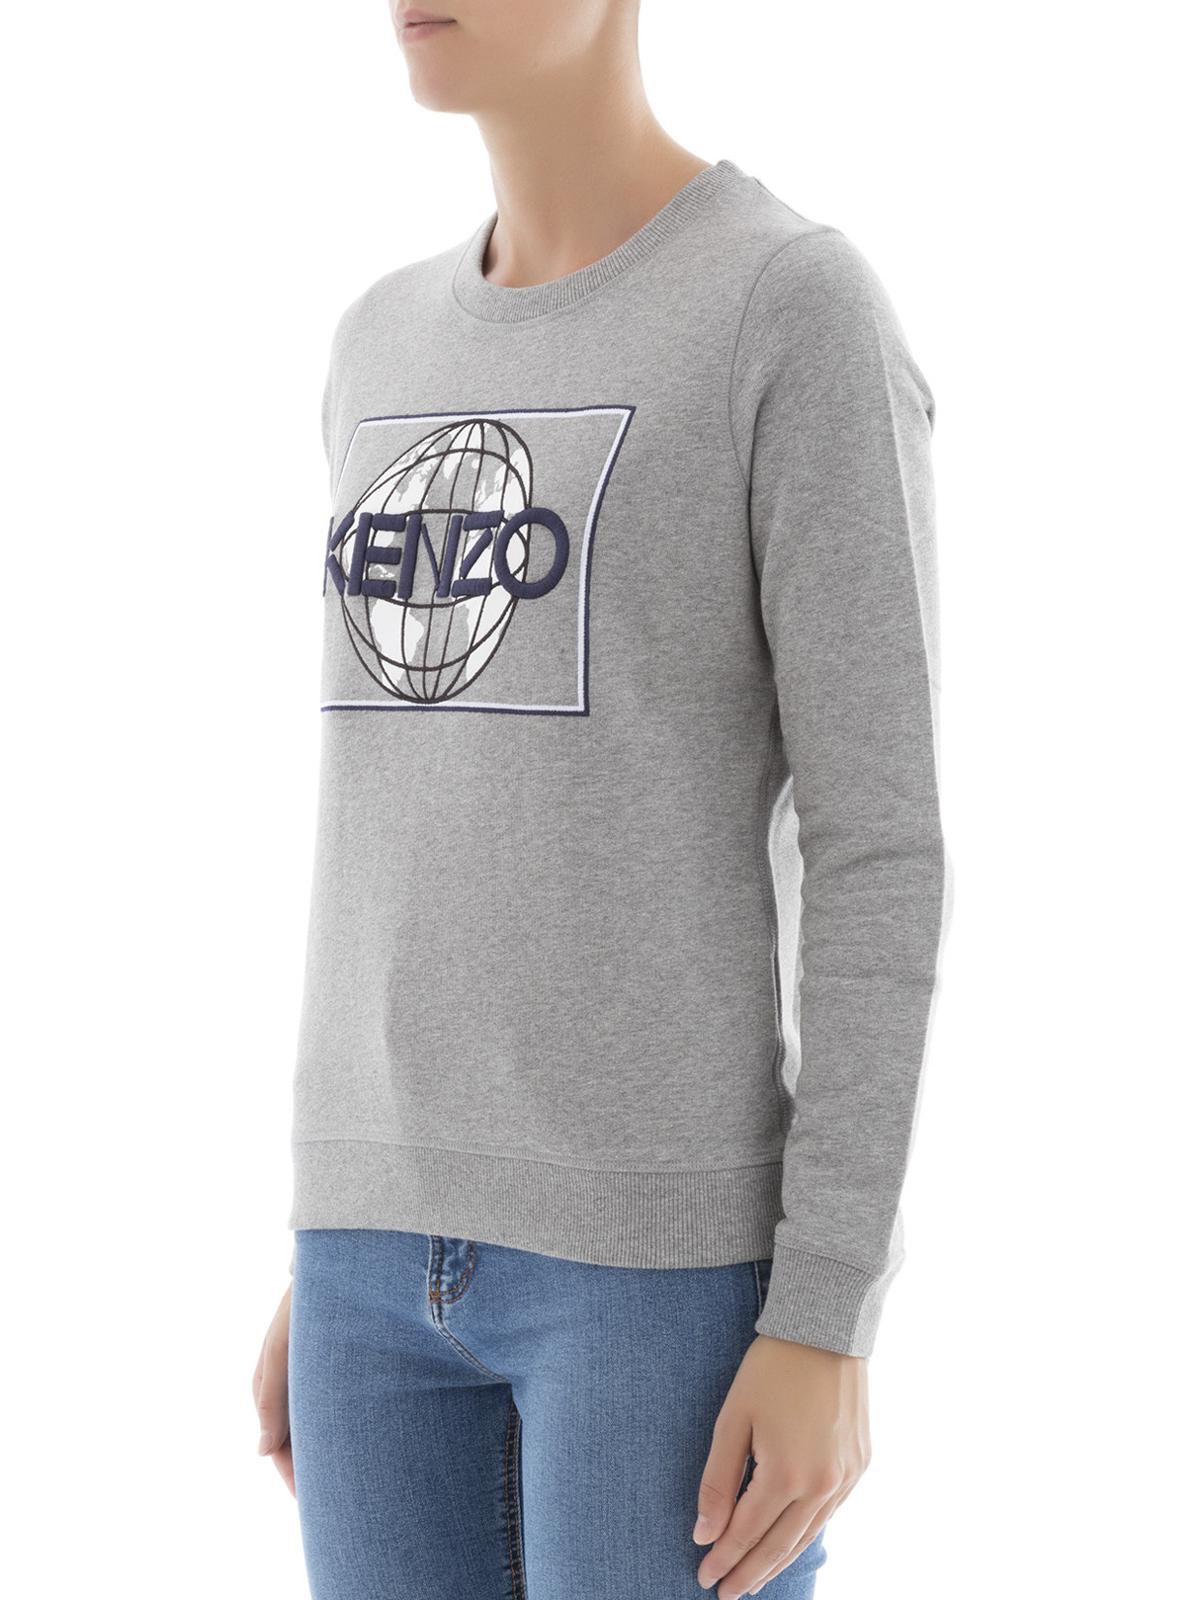 buy kenzo sweater online